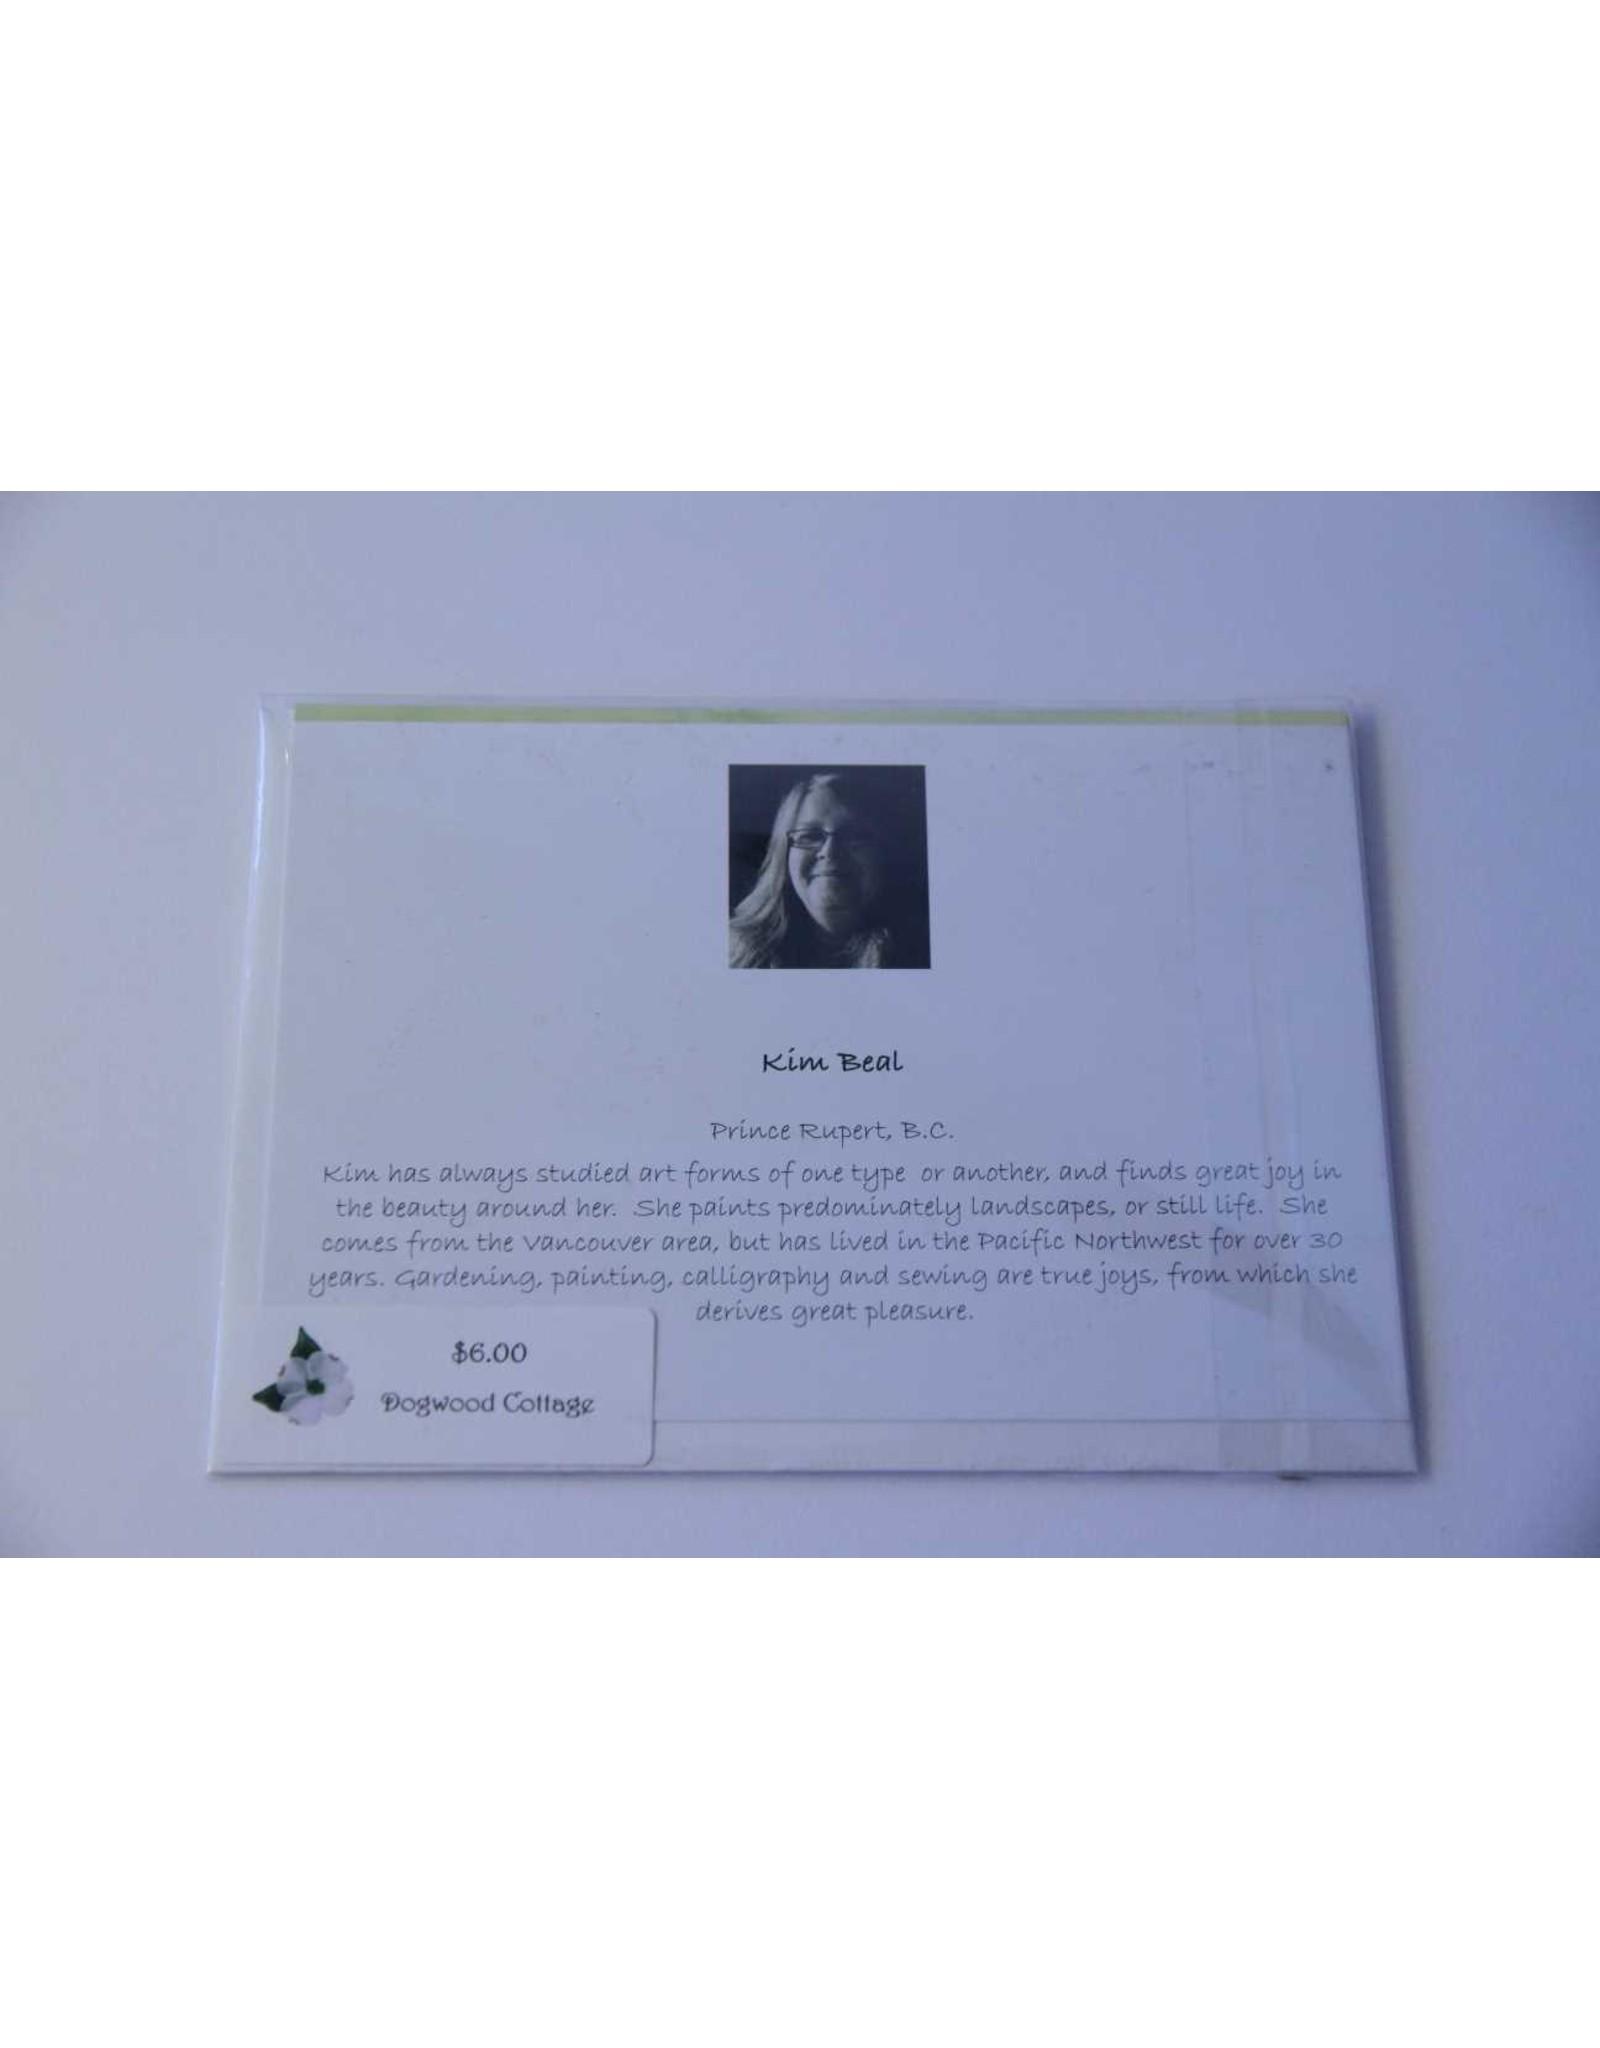 Kim Beal greeting card